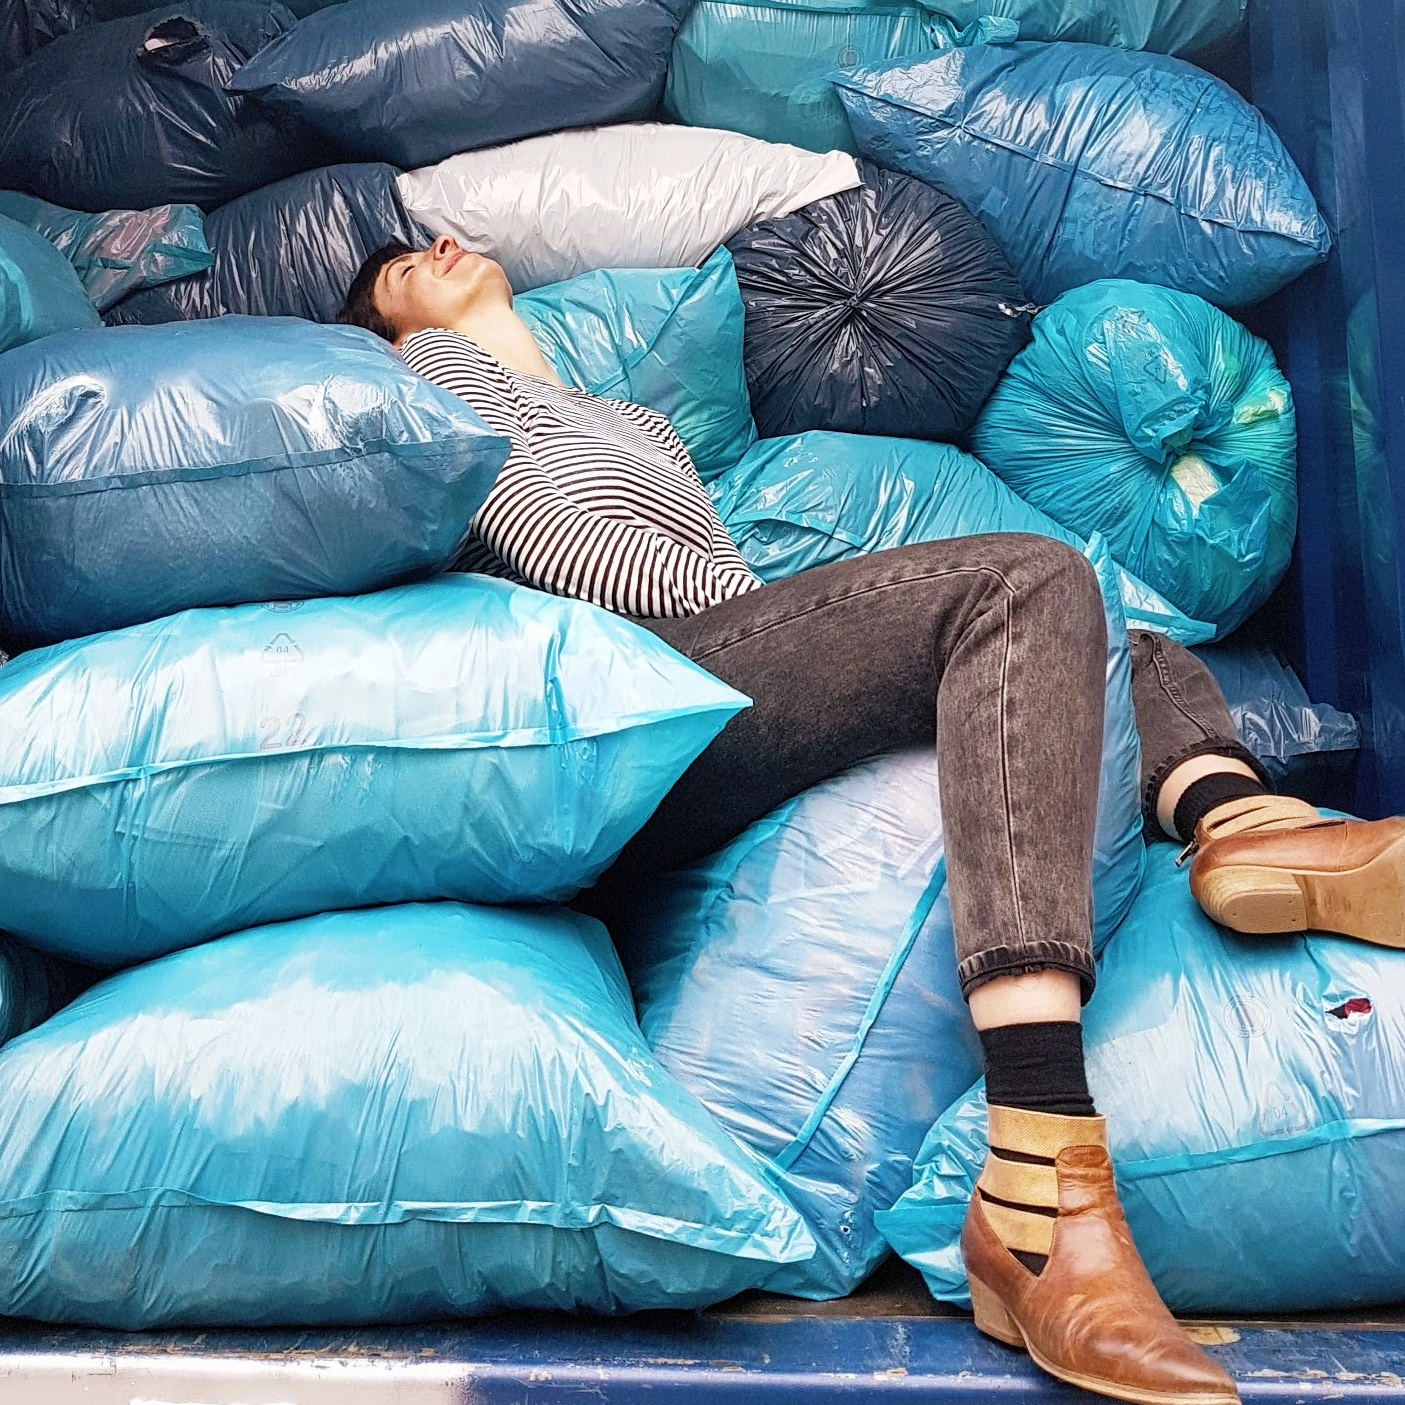 Altkleider Konsum Müllsäcke Recycling Upcycling Shopping